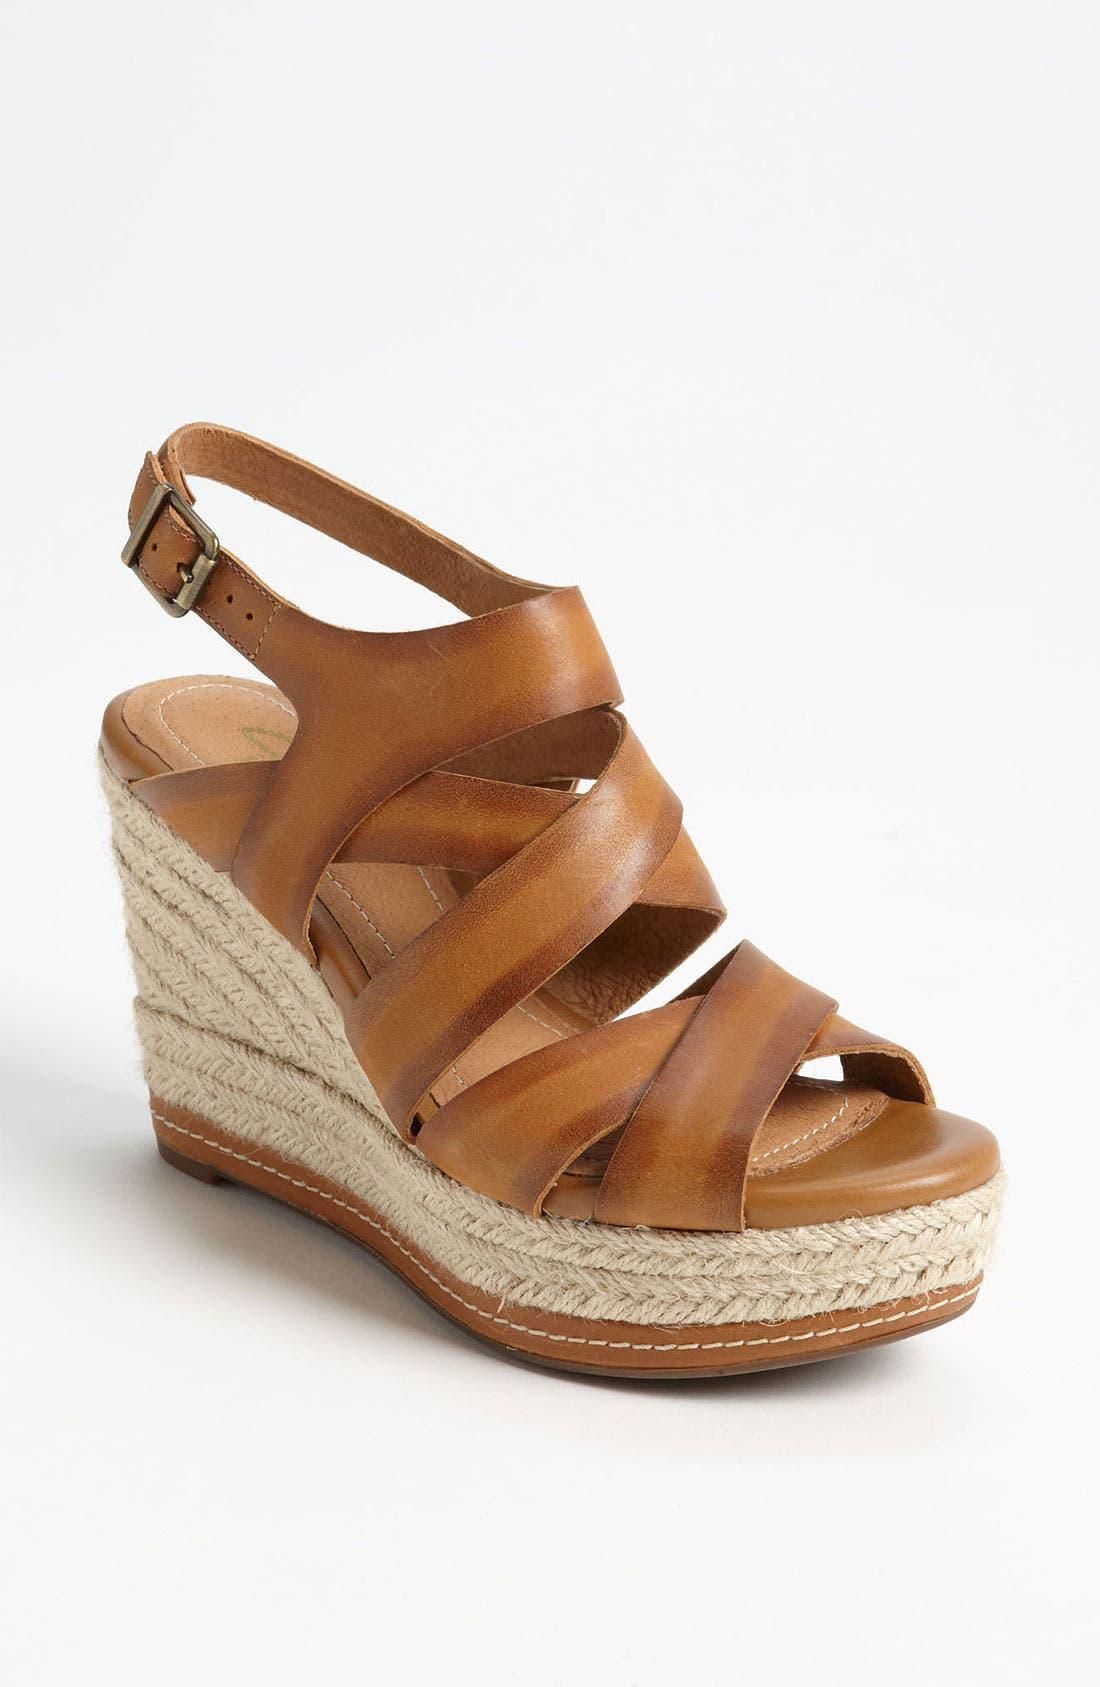 Alternate Image 1 Selected - Clarks® 'Amelia Drift' Sandal (Online Only)